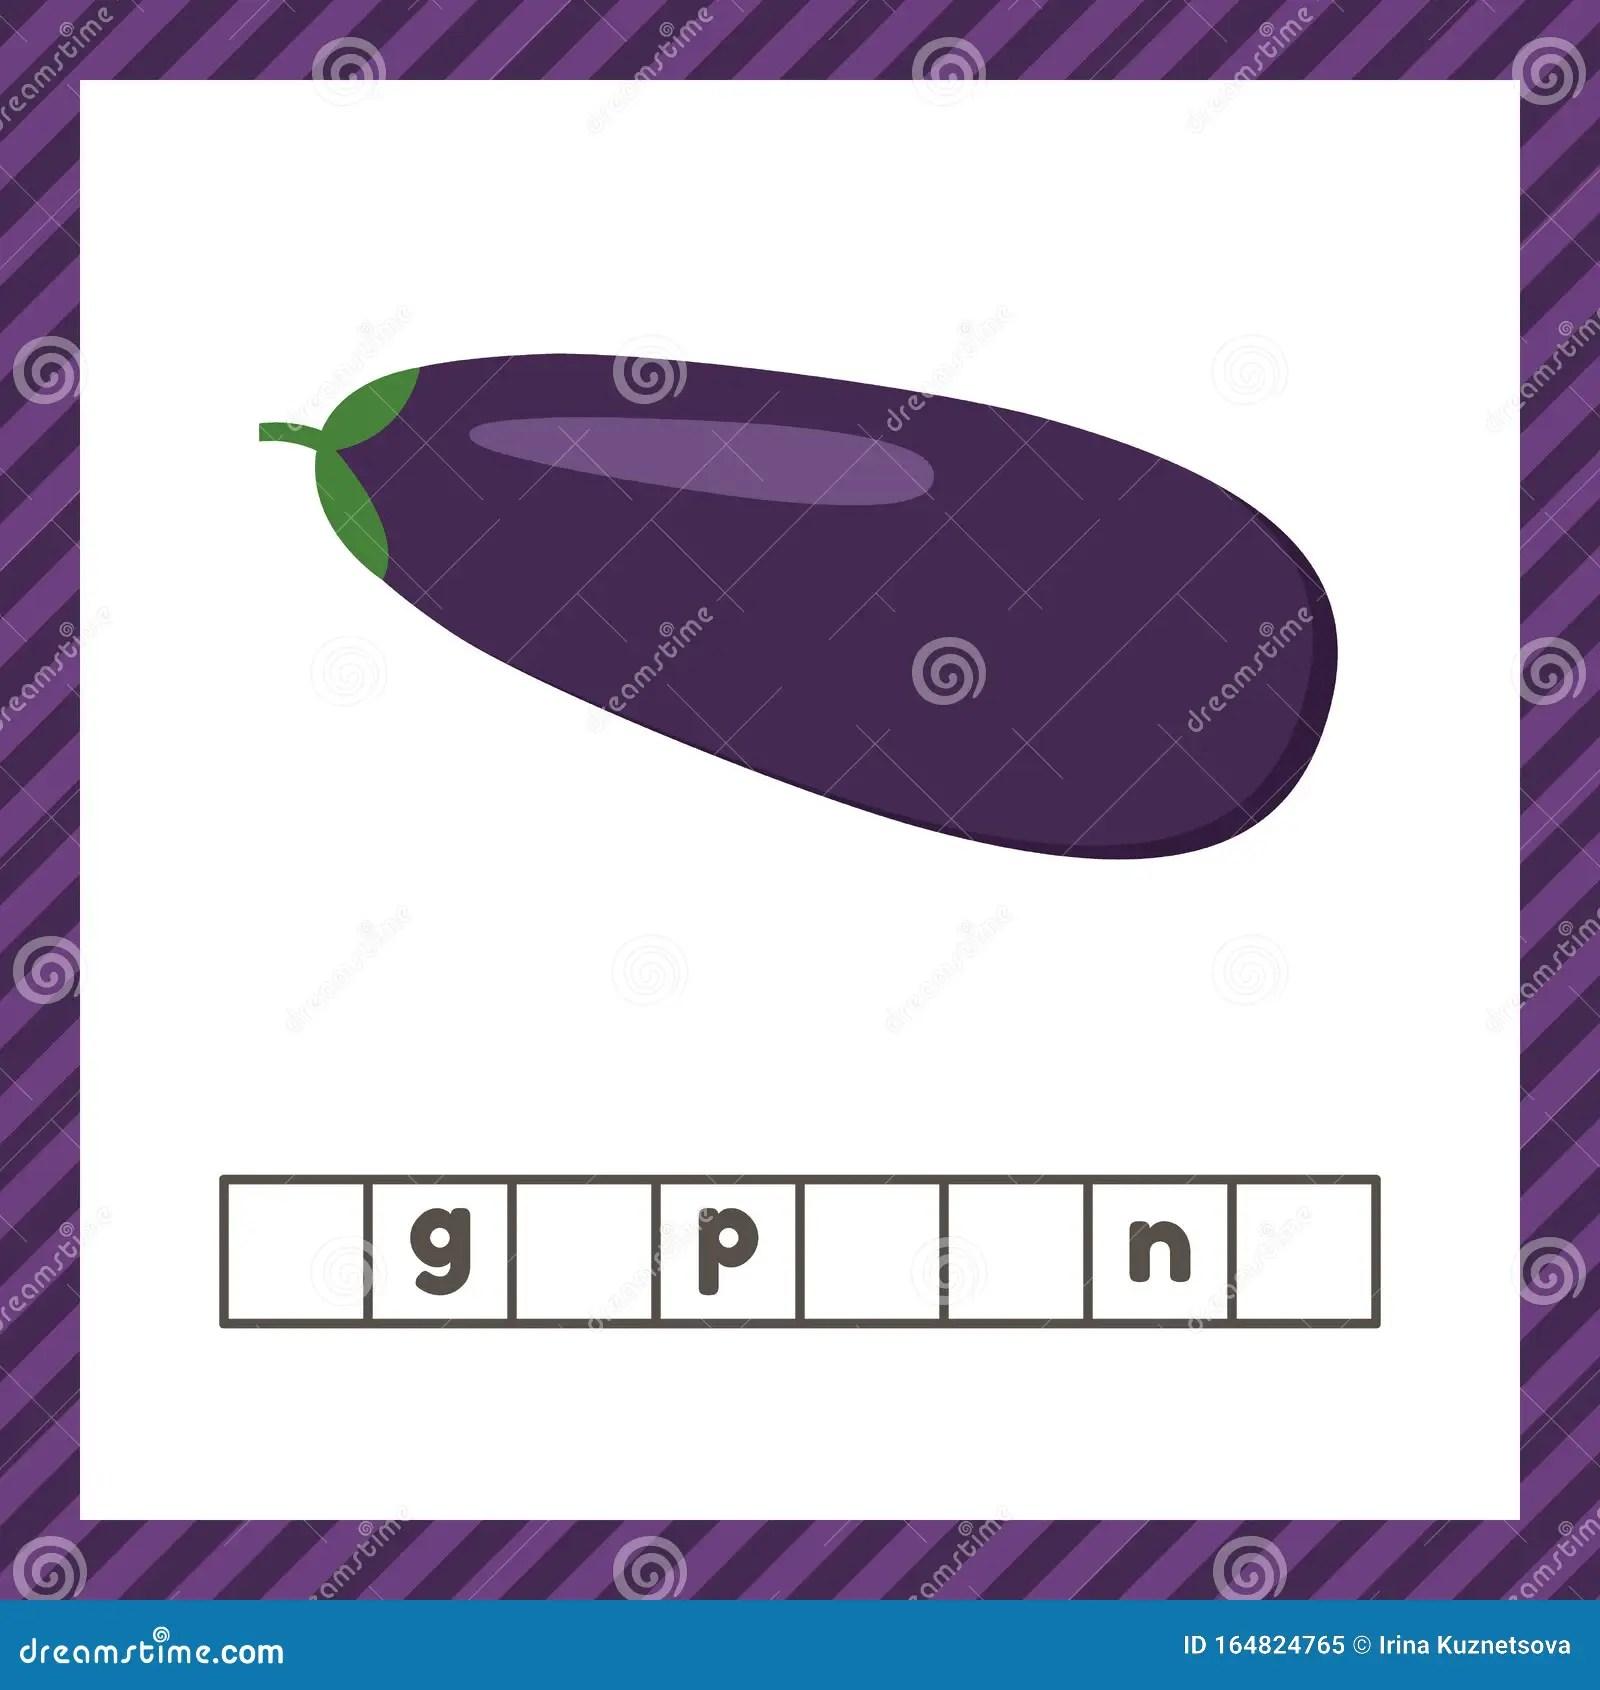 Vegetable Eggplant Educational Logic Worksheet For